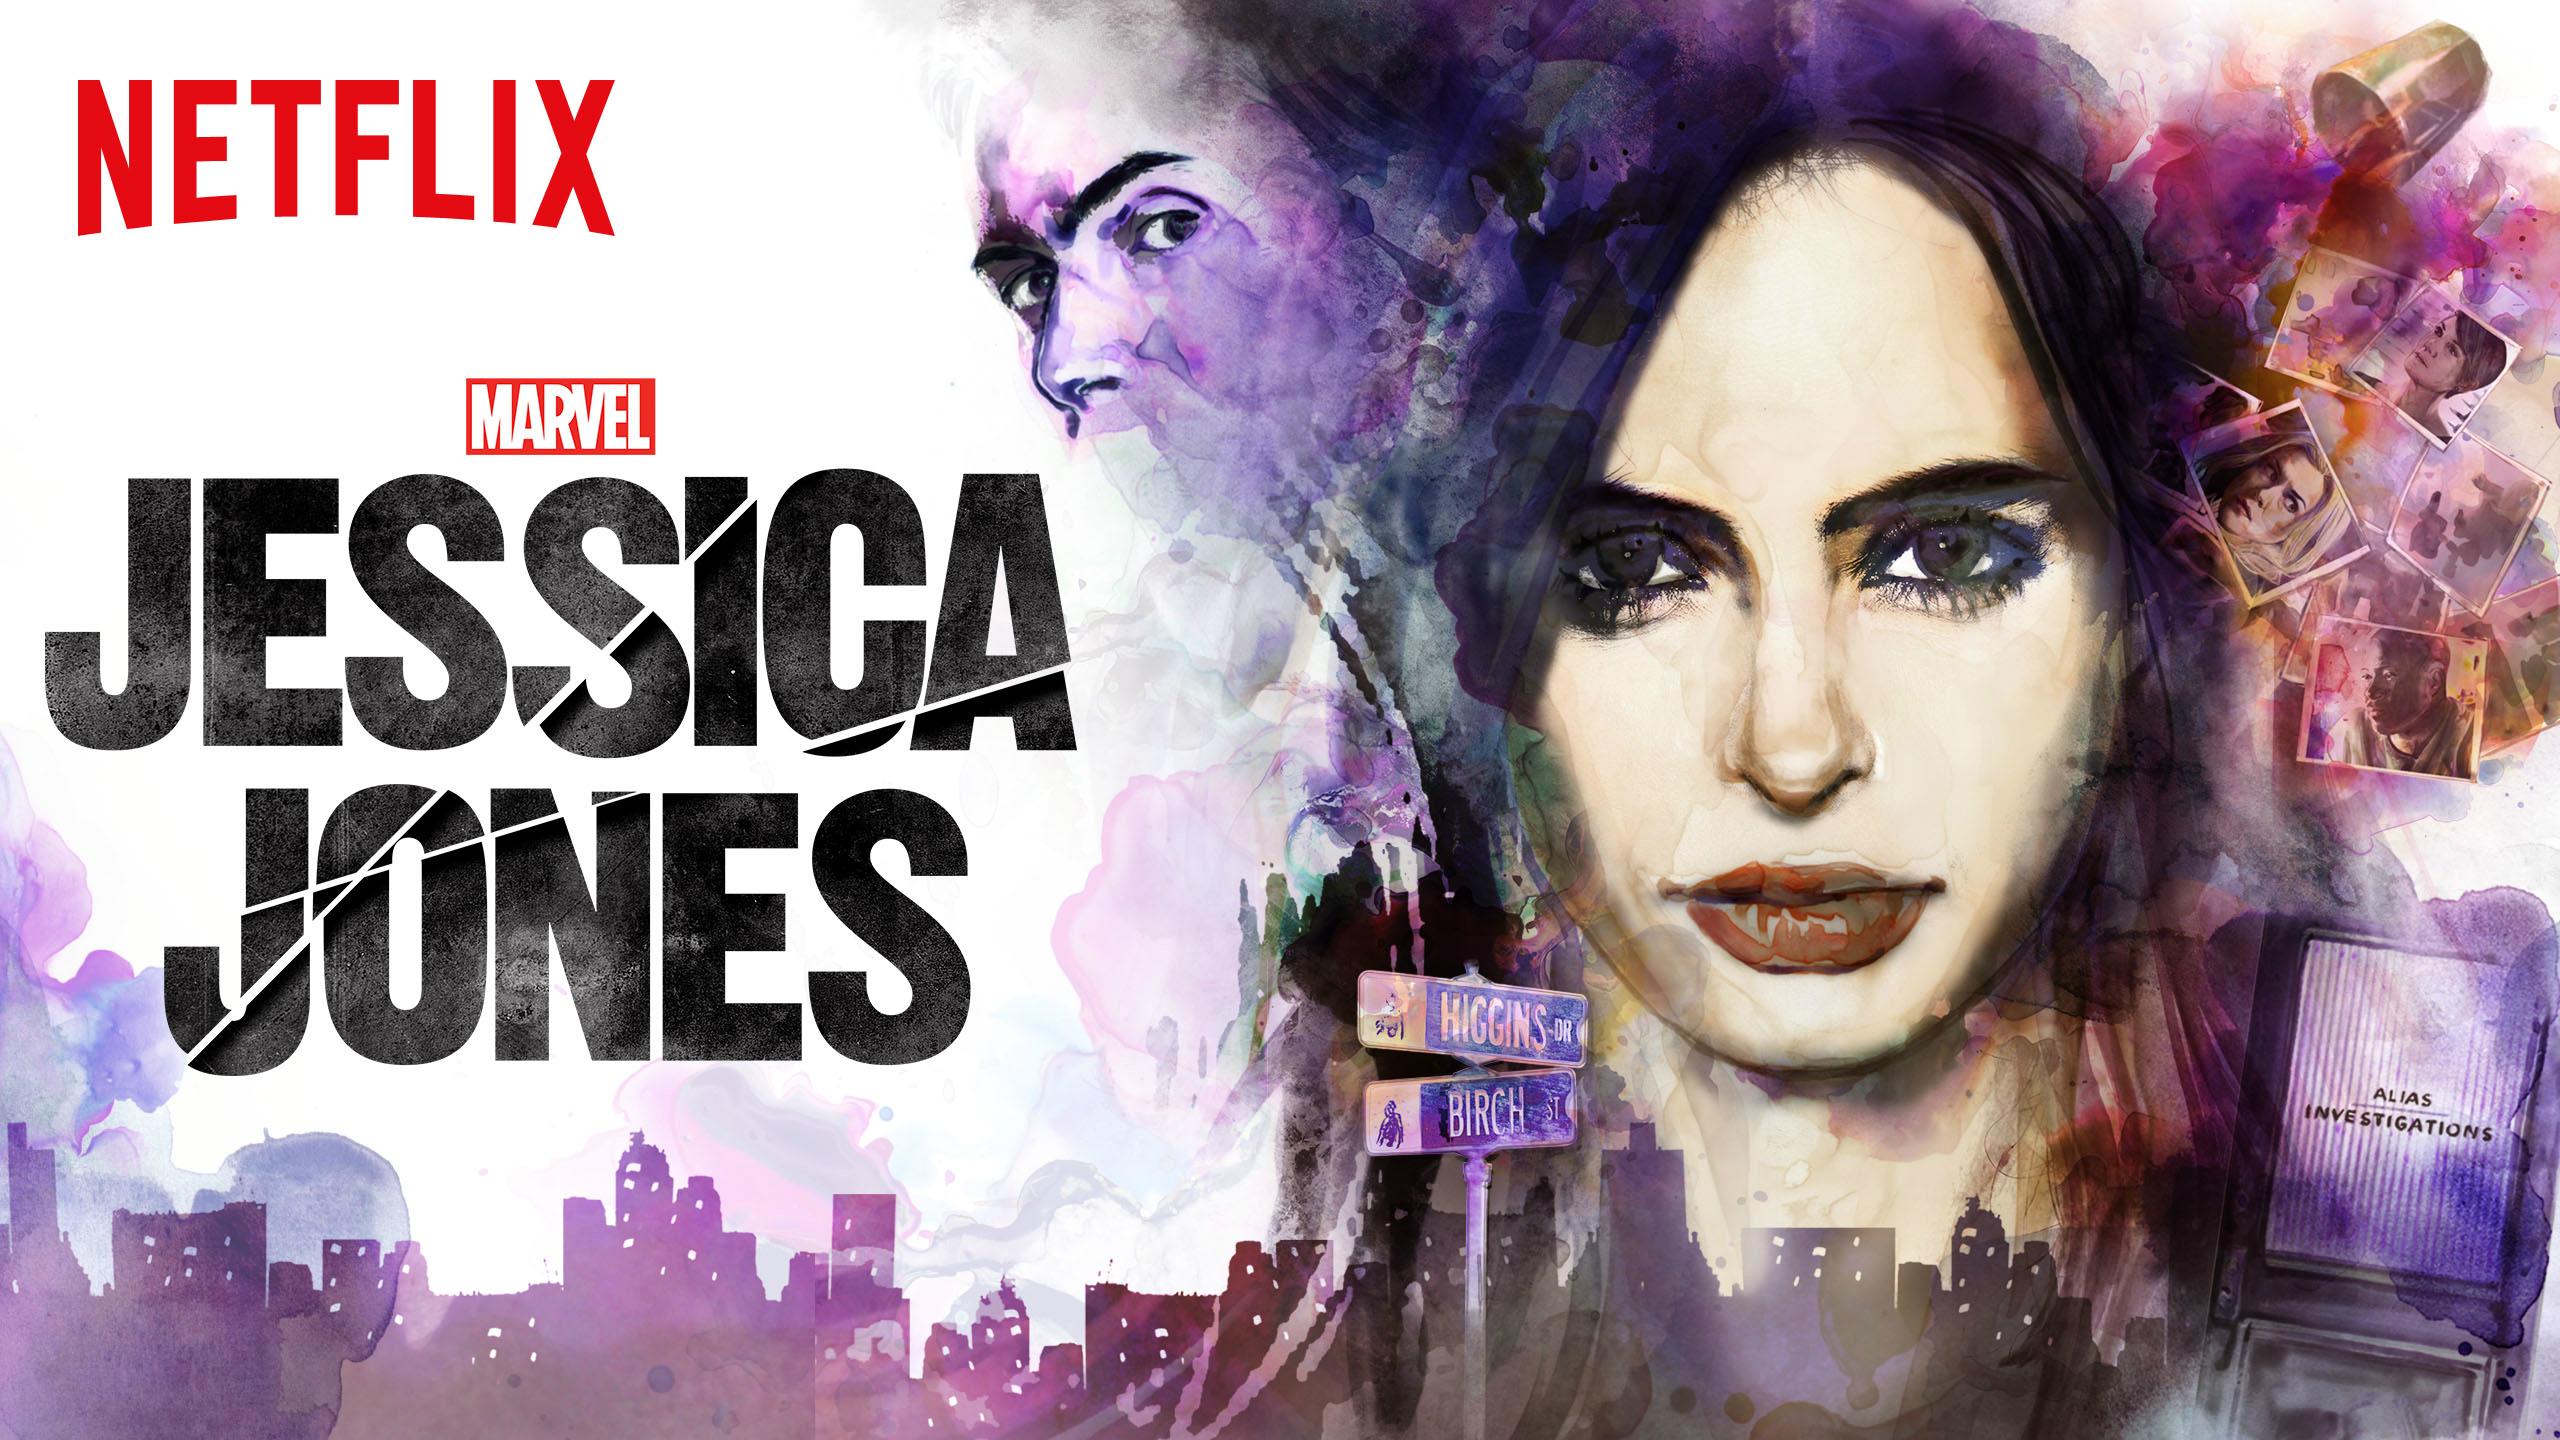 [影集] Marvel's Jessica Jones (2015~) Netflix-en-noviembre8